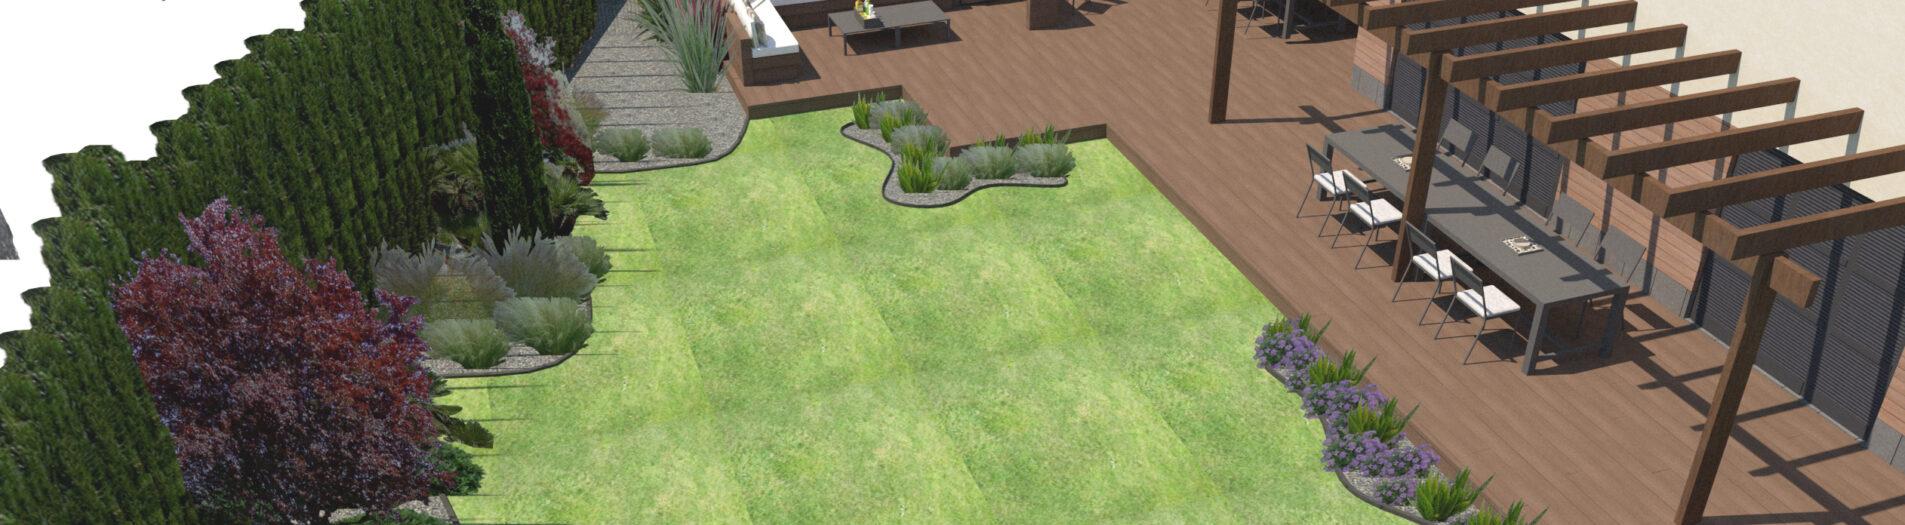 Diseño de Jardín en Reus